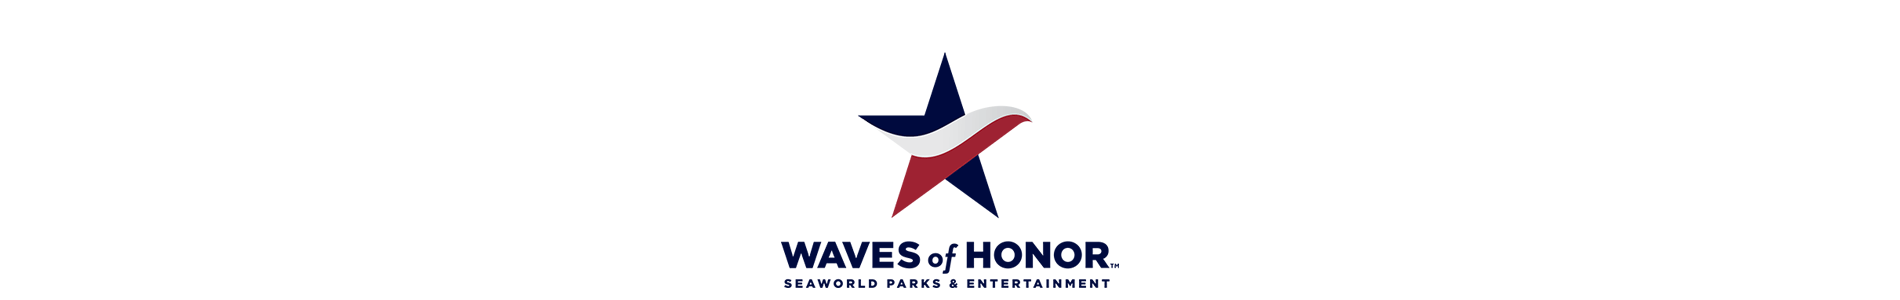 Waves of Honor Logo Banner